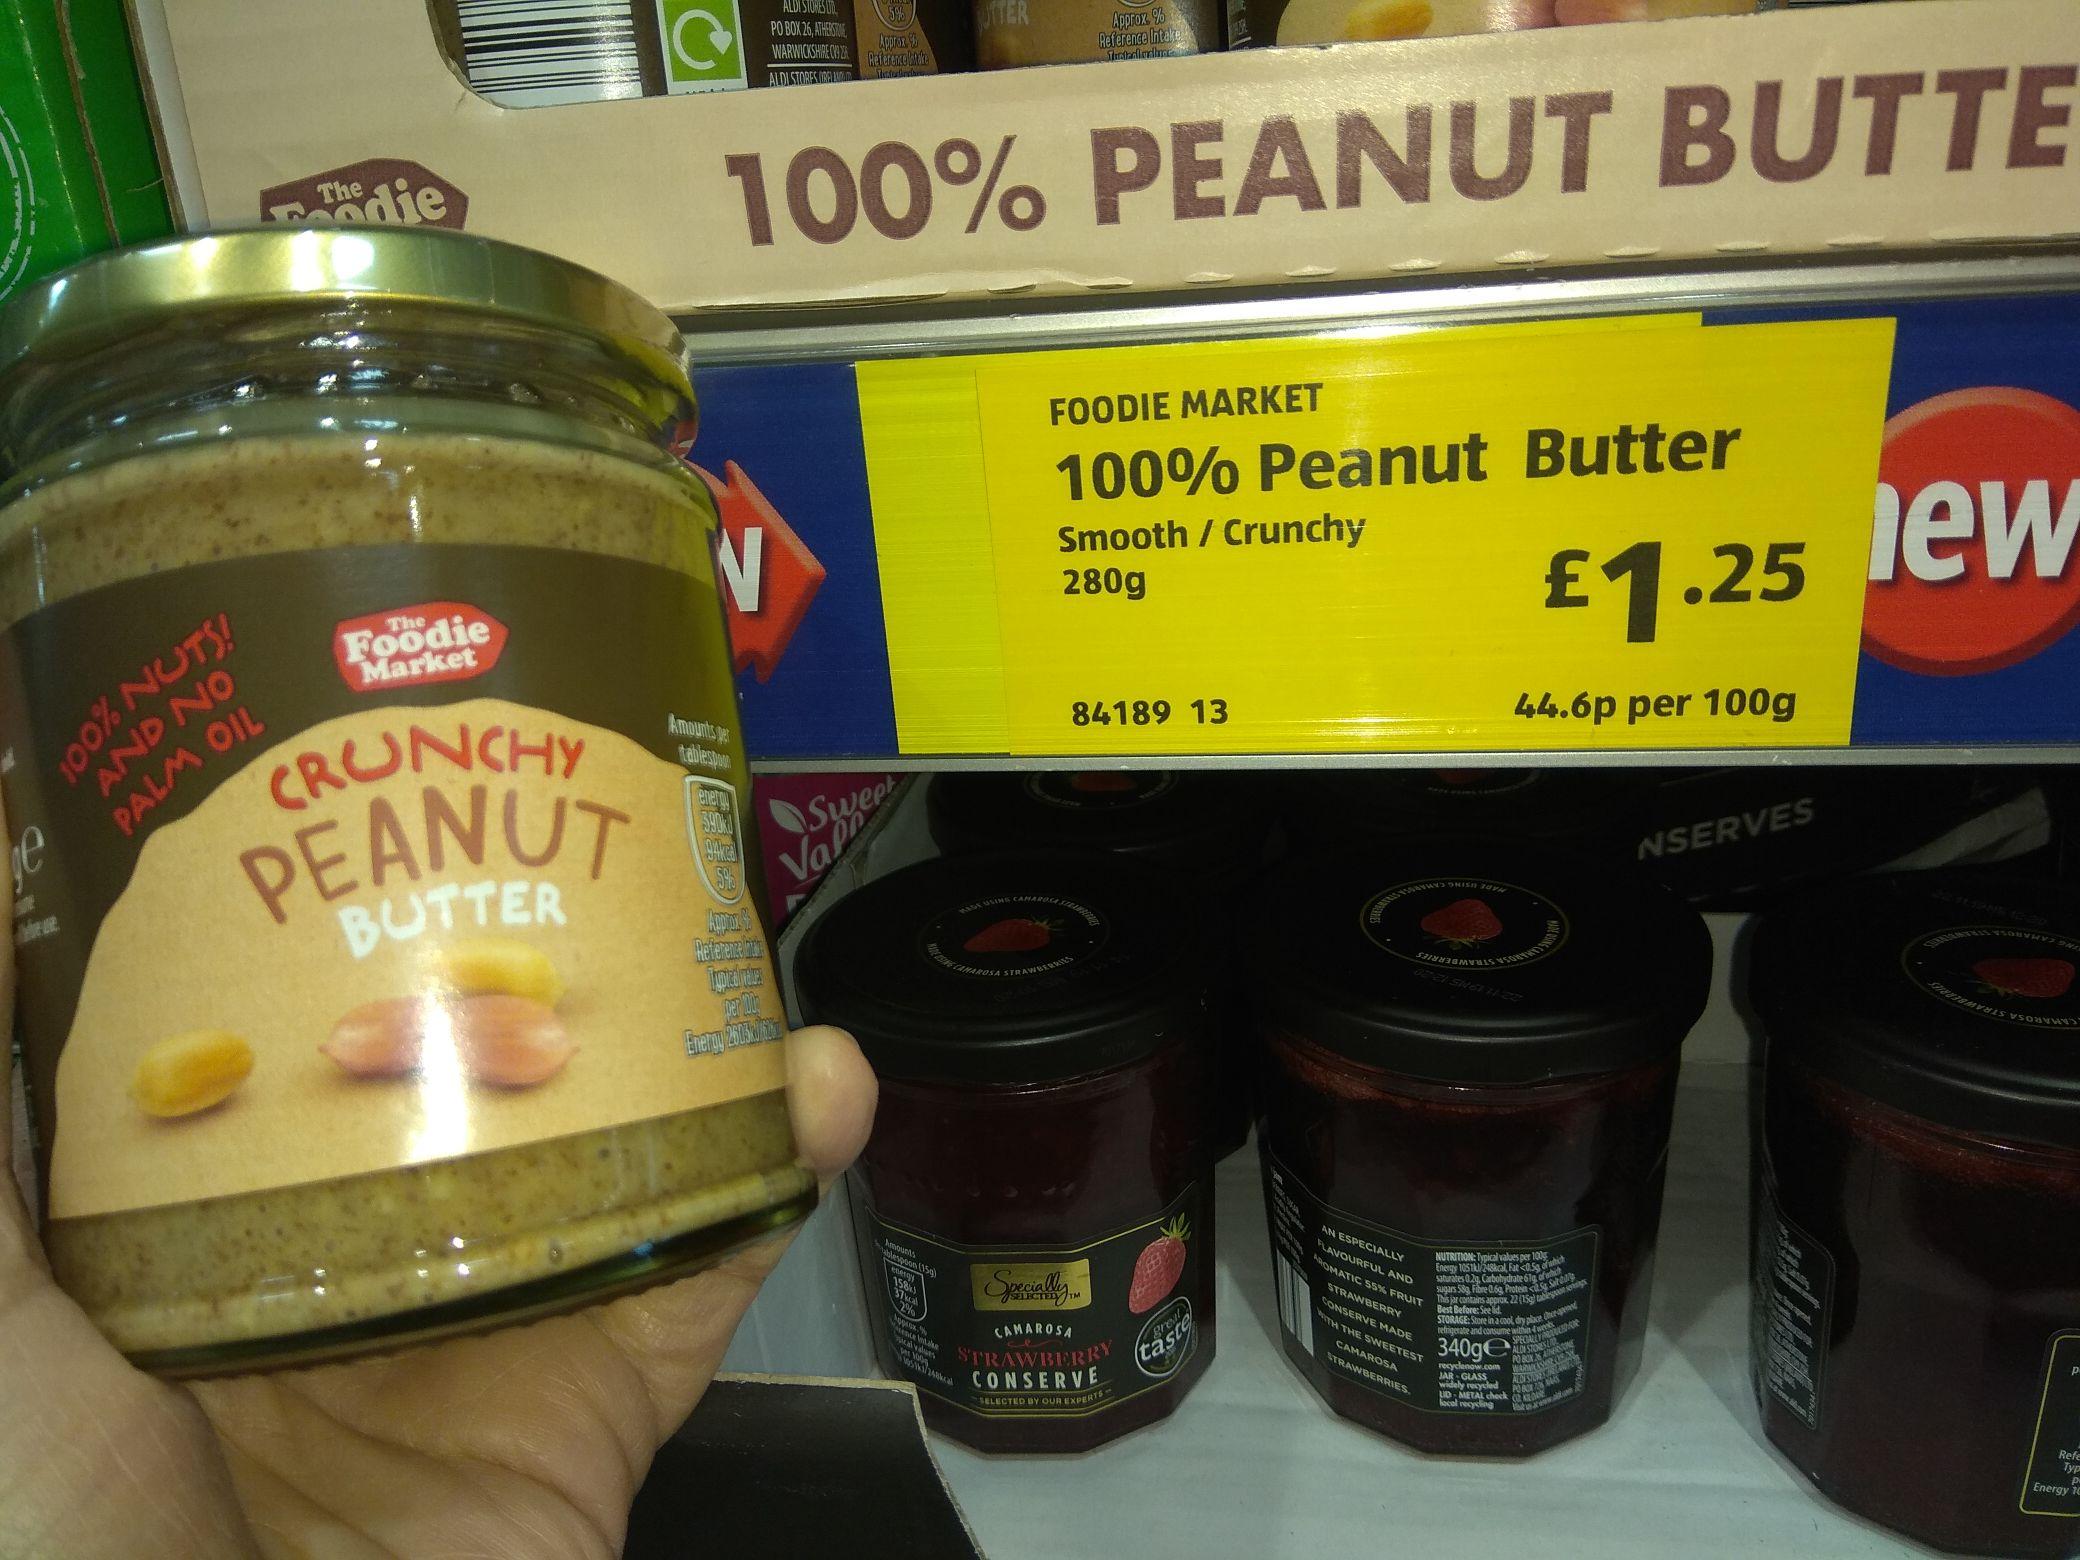 Aldi 100% peanut butter - £1.25 instore